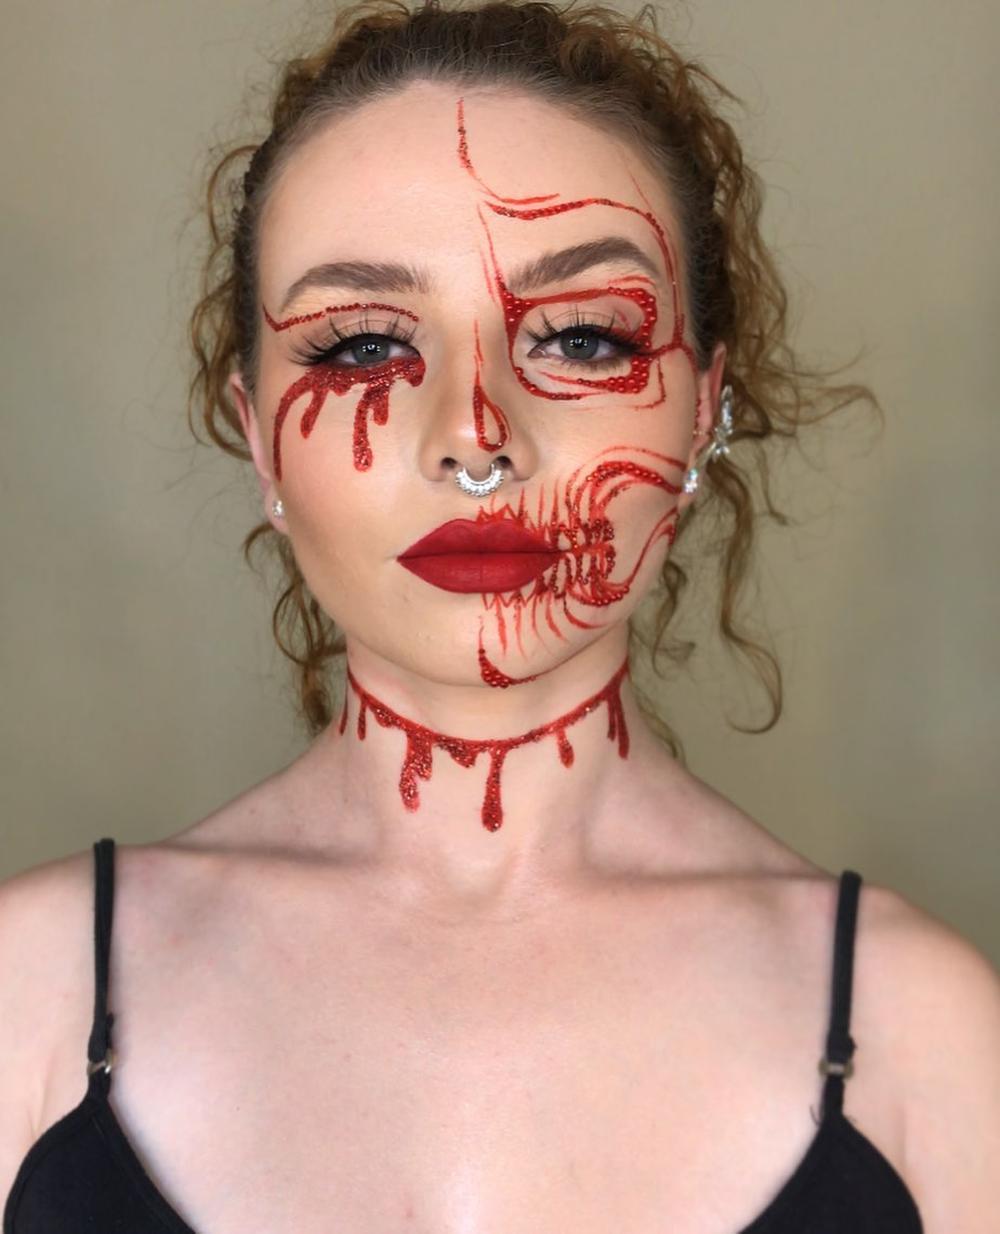 Bloody face halloween makeup ideas